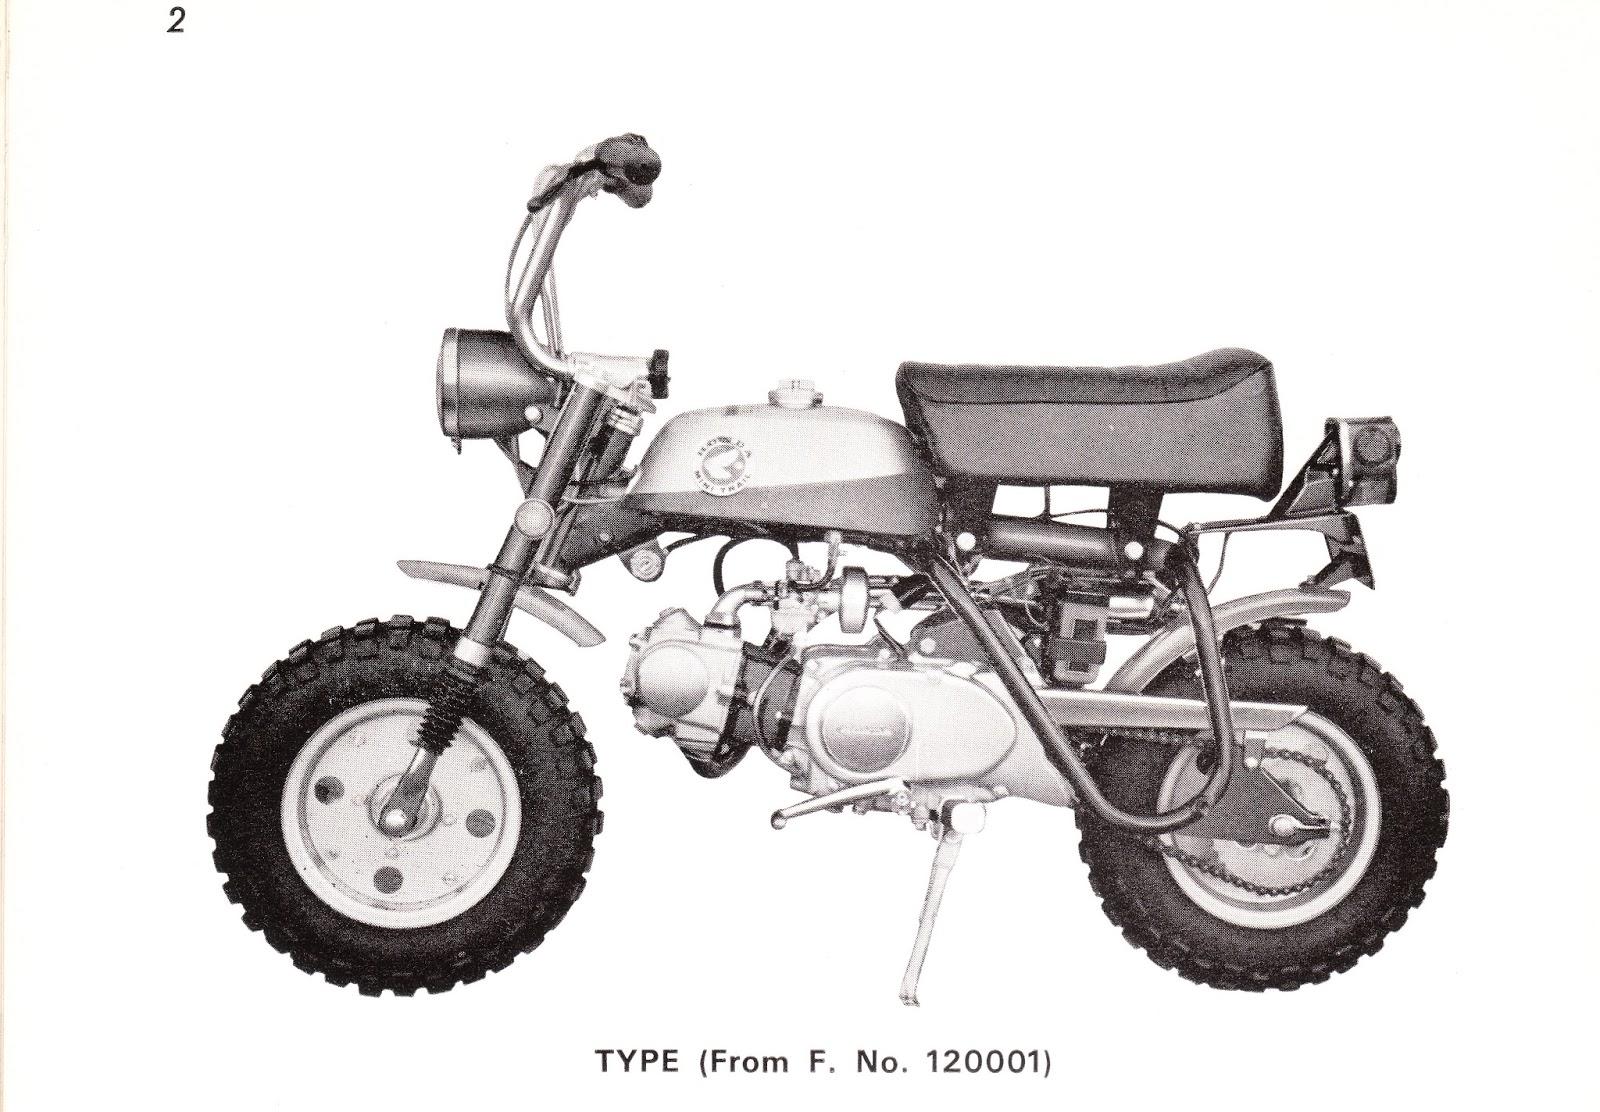 1971 Honda Z50 Wiring Diagram 3 Circle Venn Worksheet A Mini Trail Restoration Project Monkey